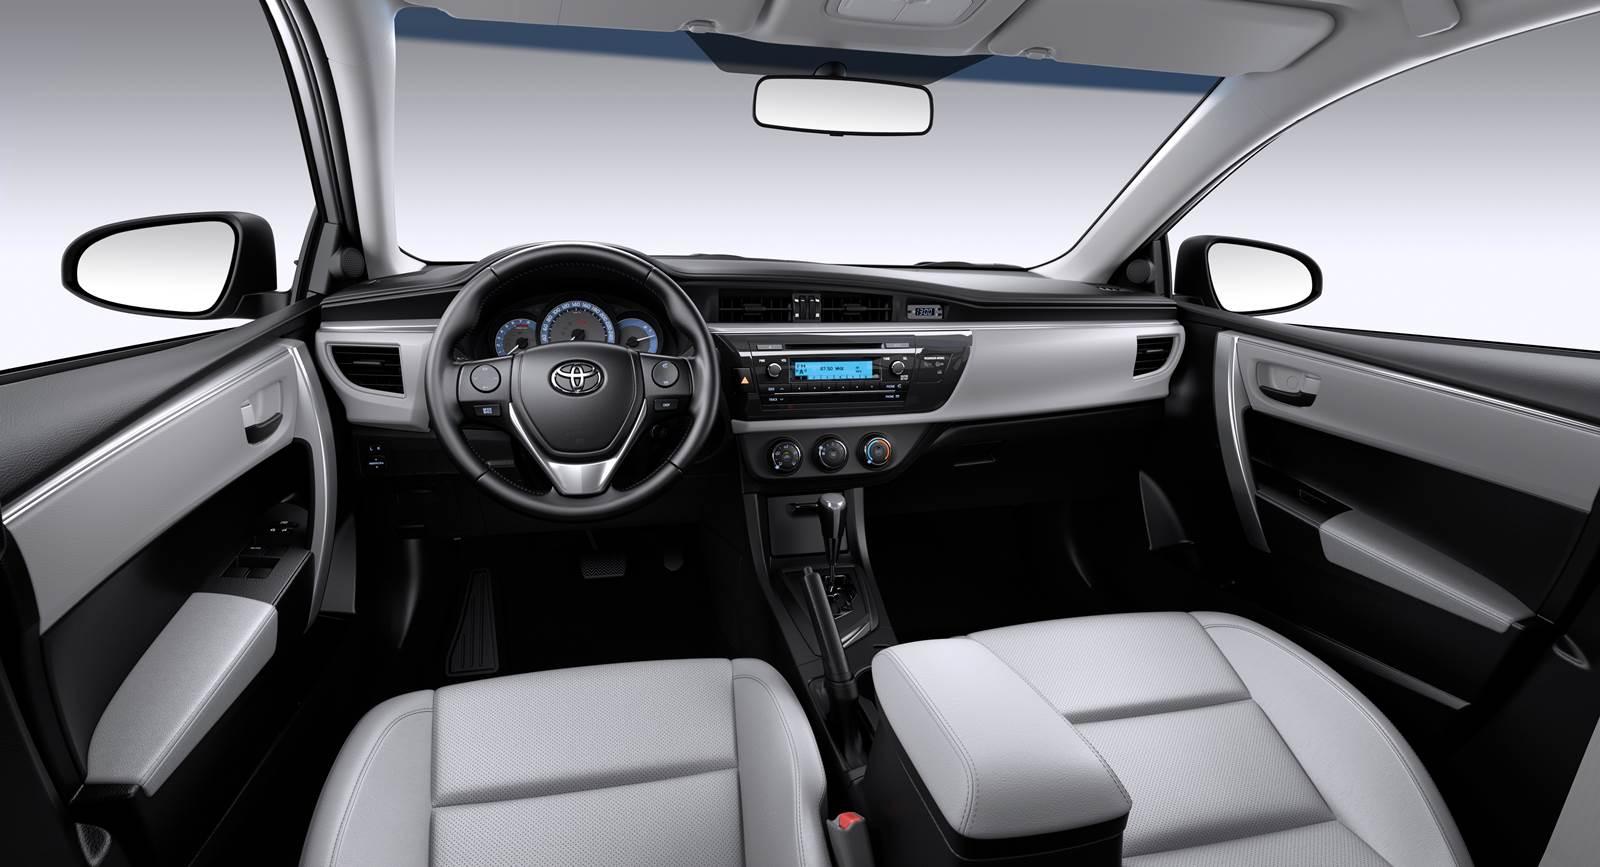 Toyota Corolla 2017 - Interior